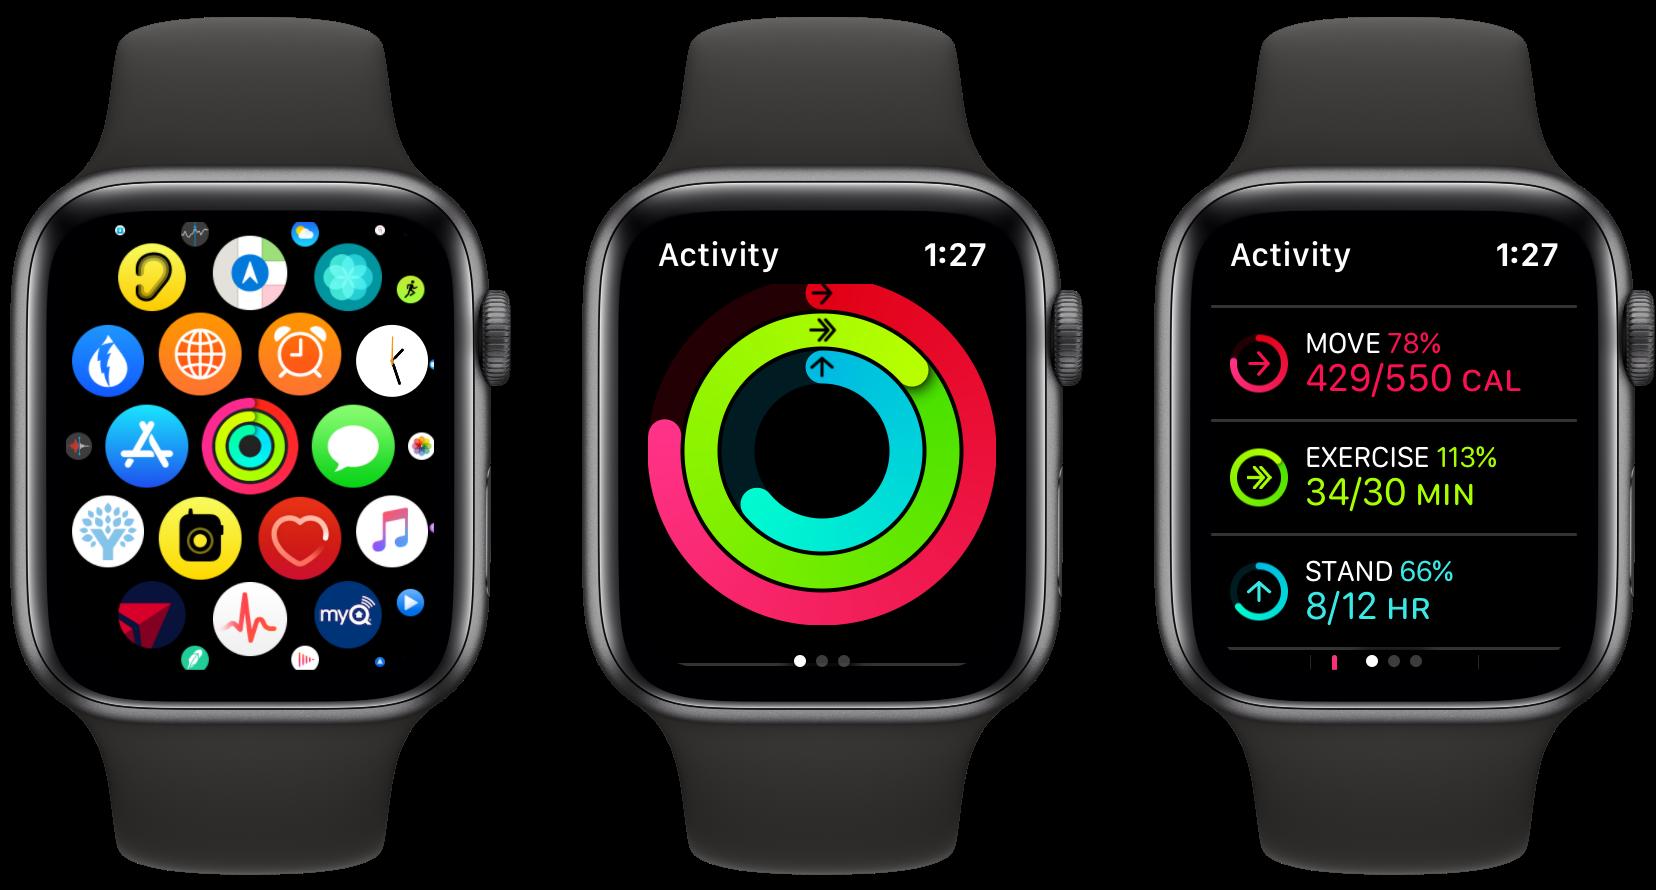 "<span href=""https://9to5mac.com/2020/02/11/apple-watch-how-to-see-calories-burned-active-and-passive/"">Apple Watch: Cómo ver las calorías quemadas, tanto activo como pasivo</a>"